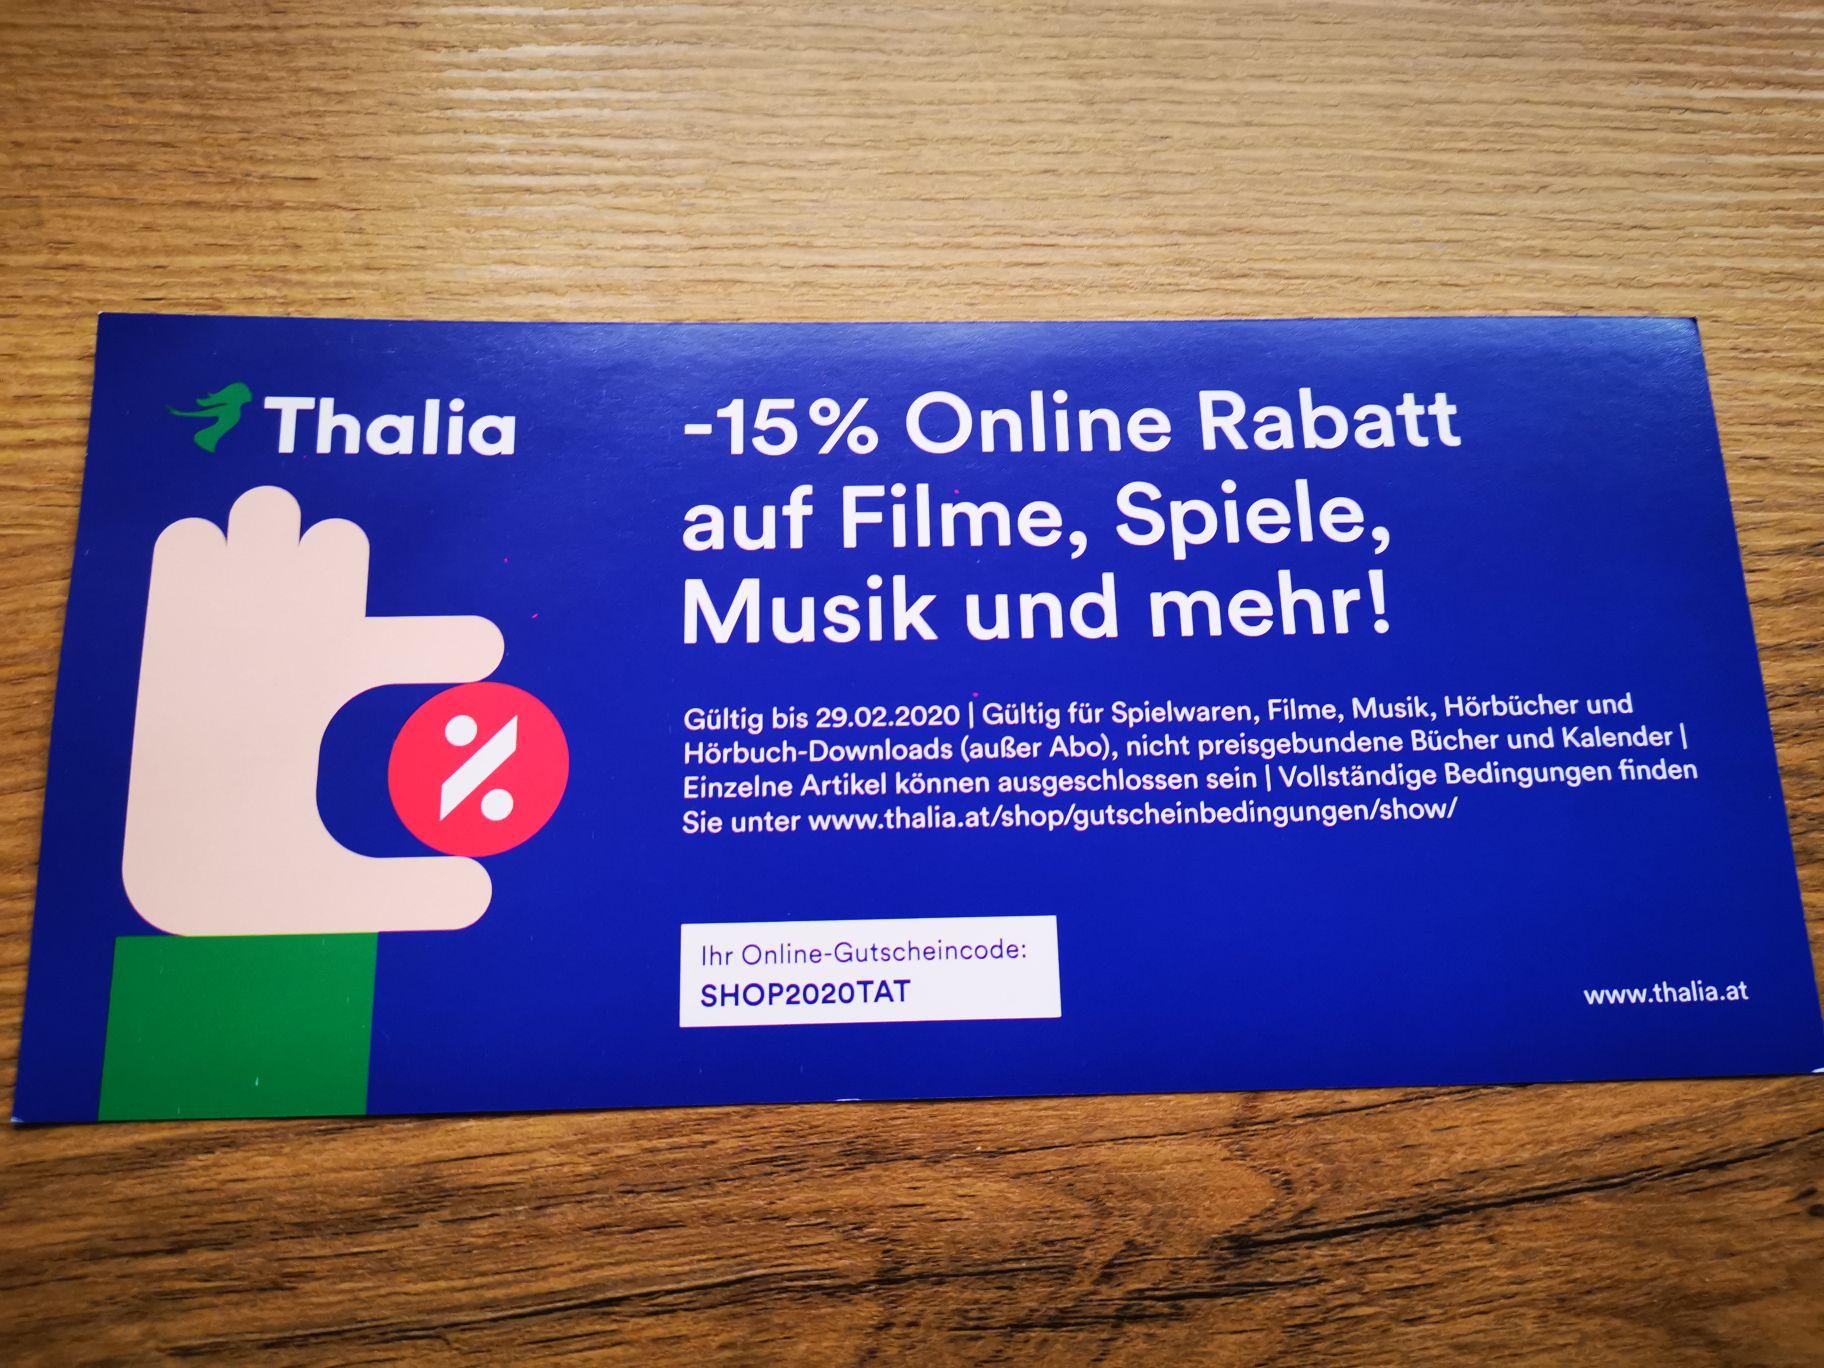 Thalia 15% Online Rabatt